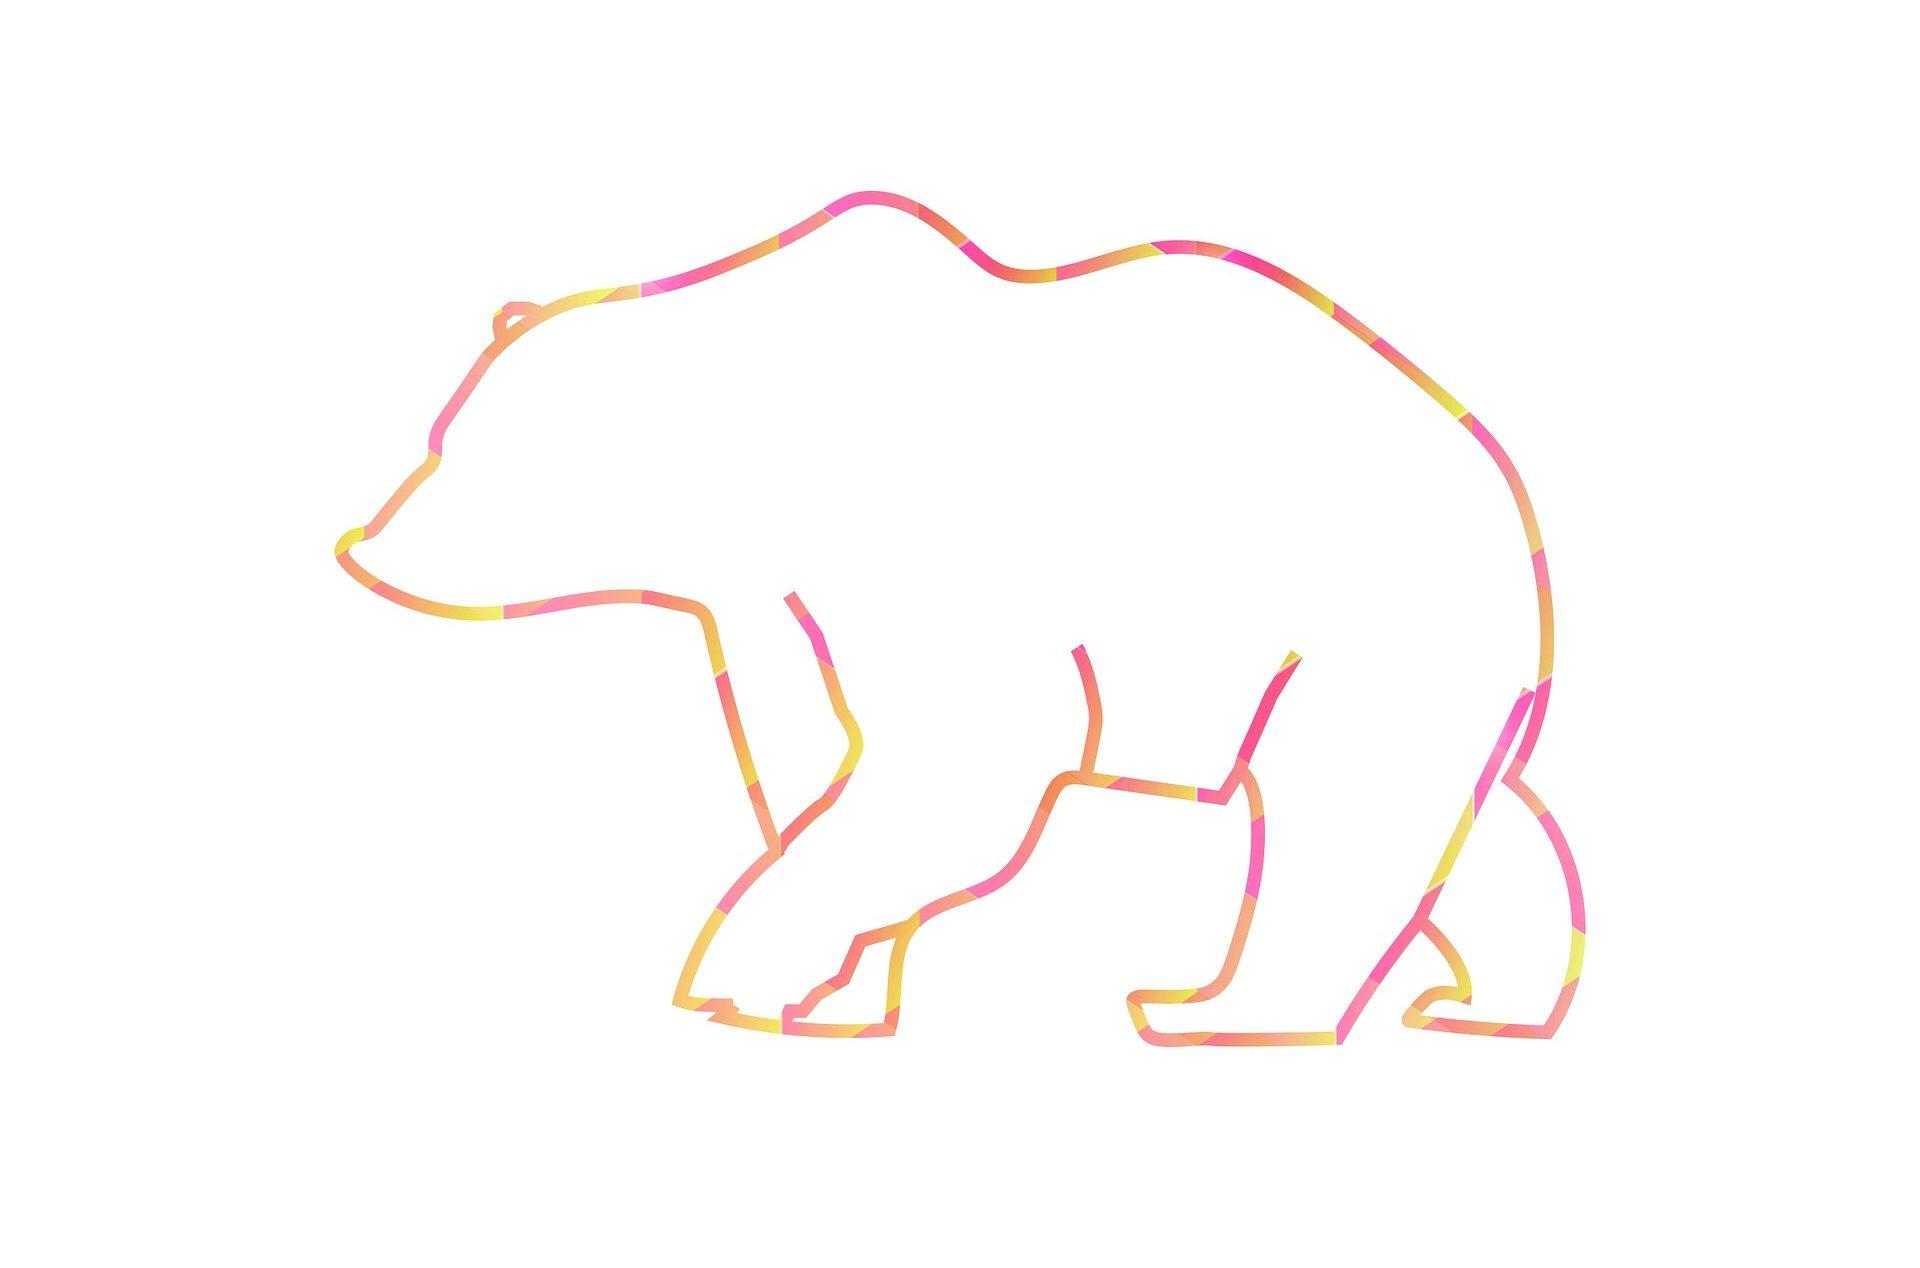 Bear Necessities Marketing